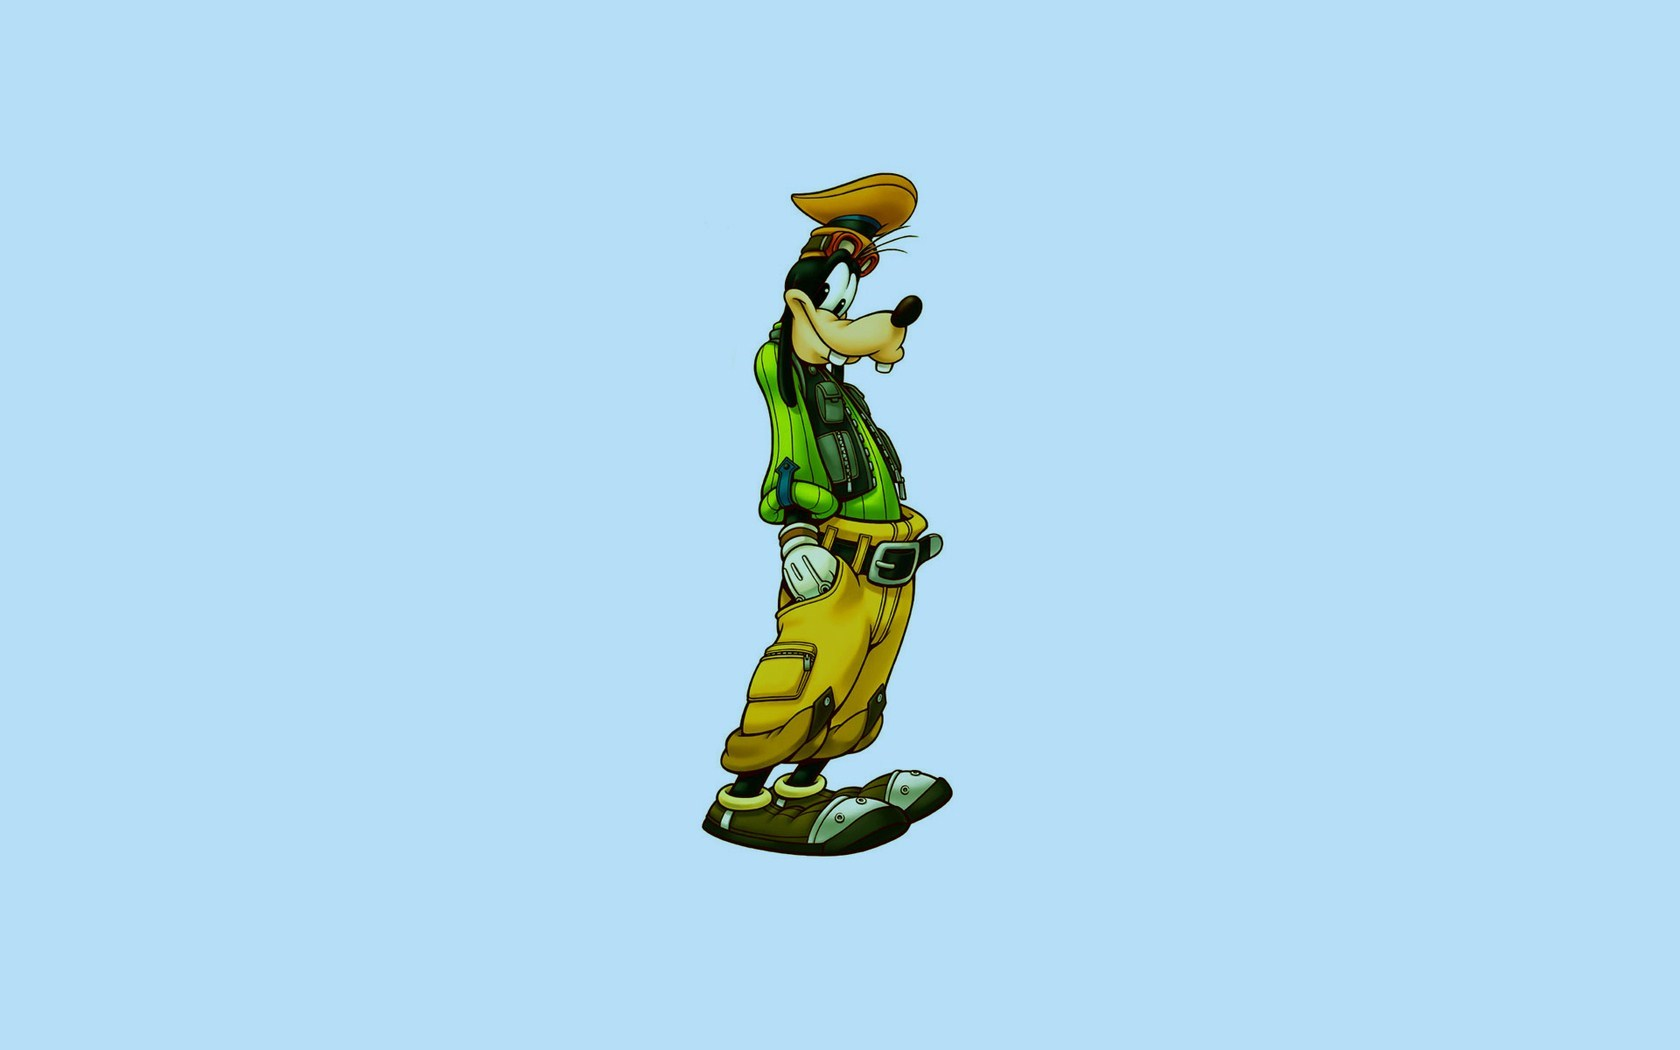 Goofy Minimalist Disney Funny